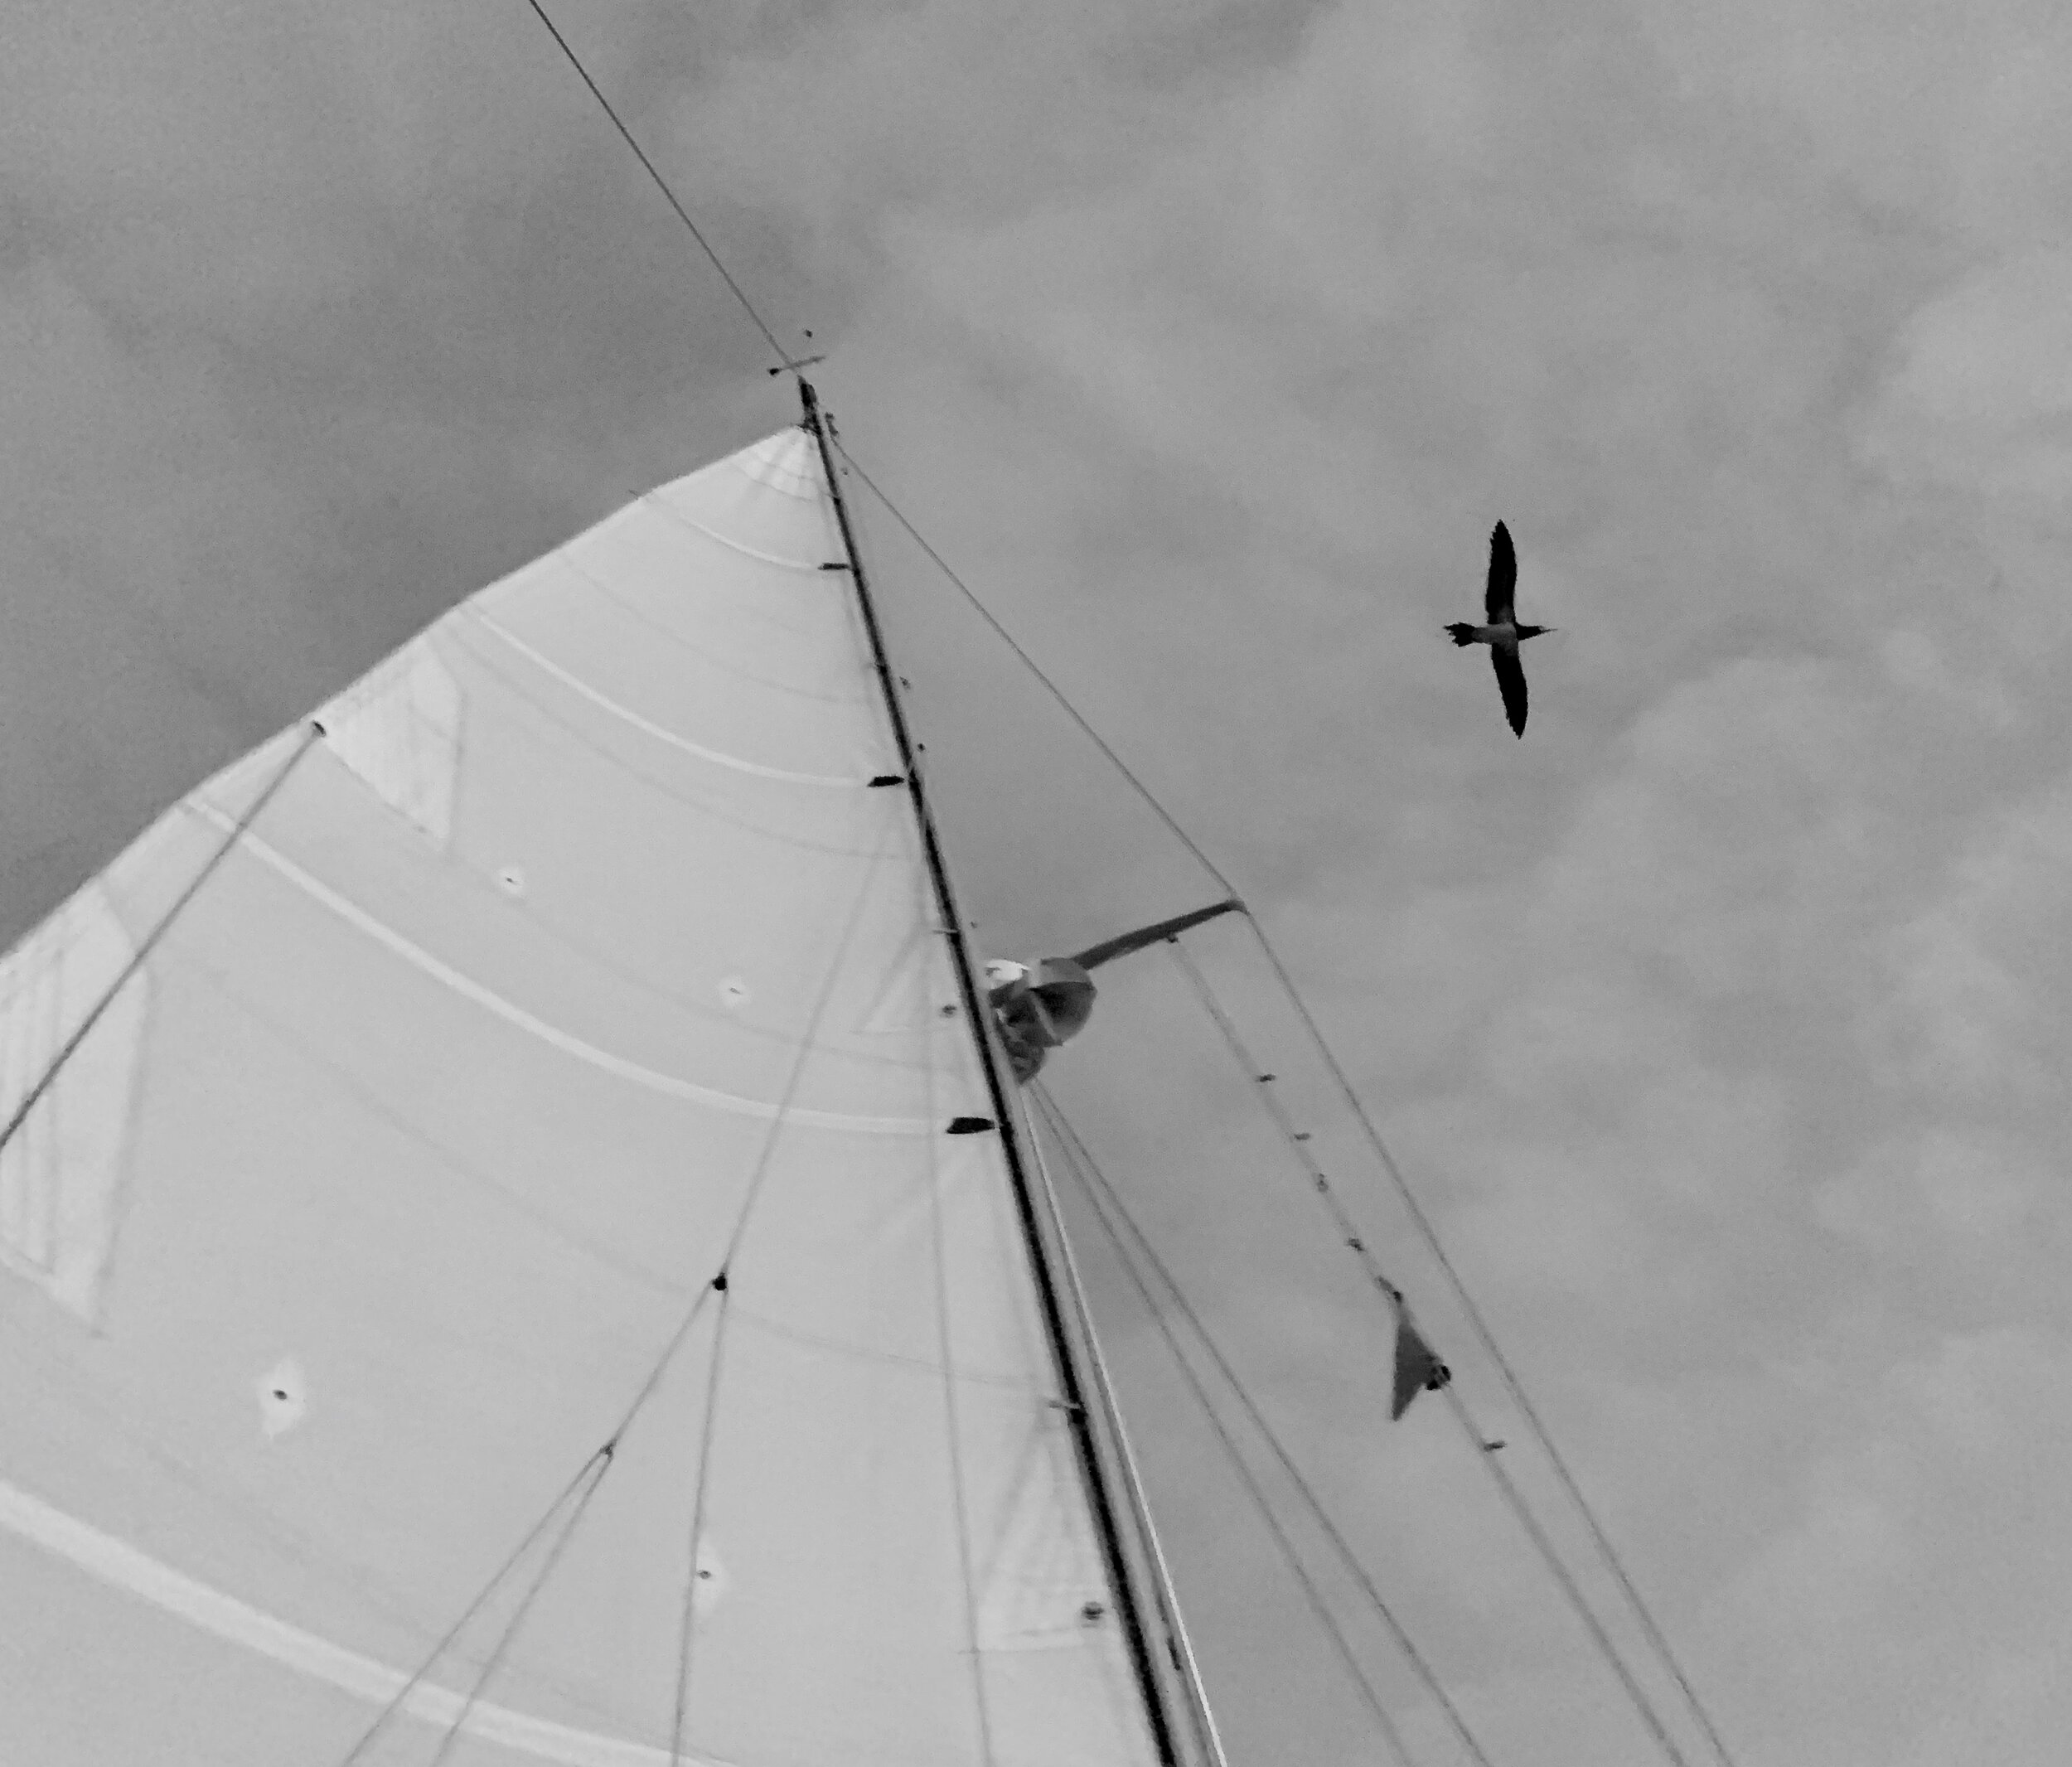 soaring bird overhead